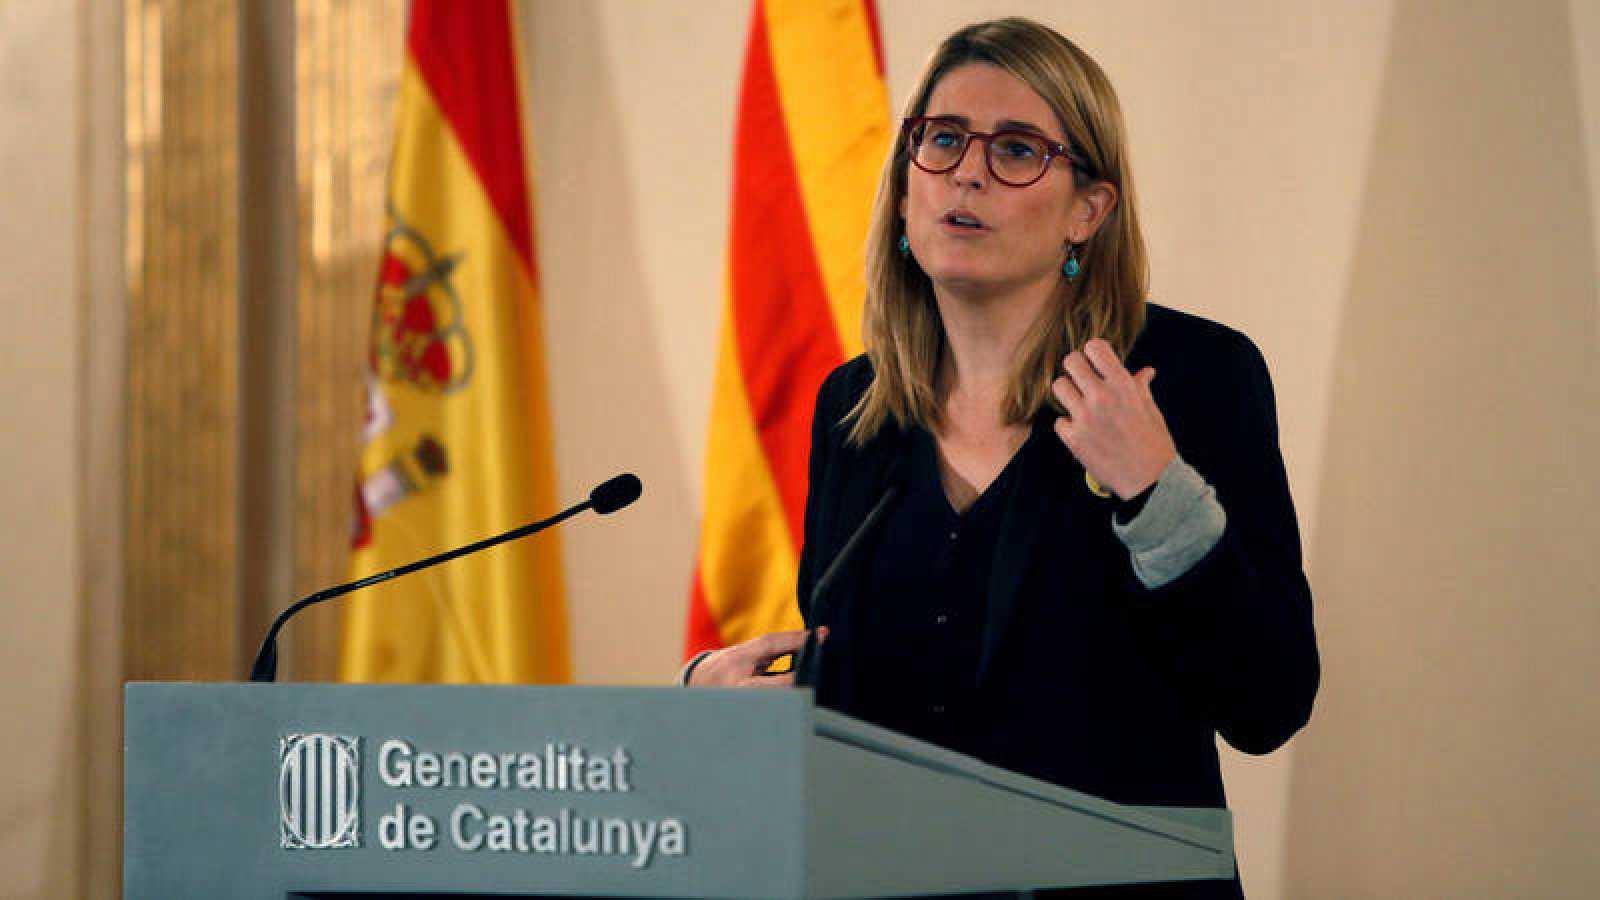 La consejera de Presidencia de la Generalitat, Elsa Artadi, en rueda de prensa